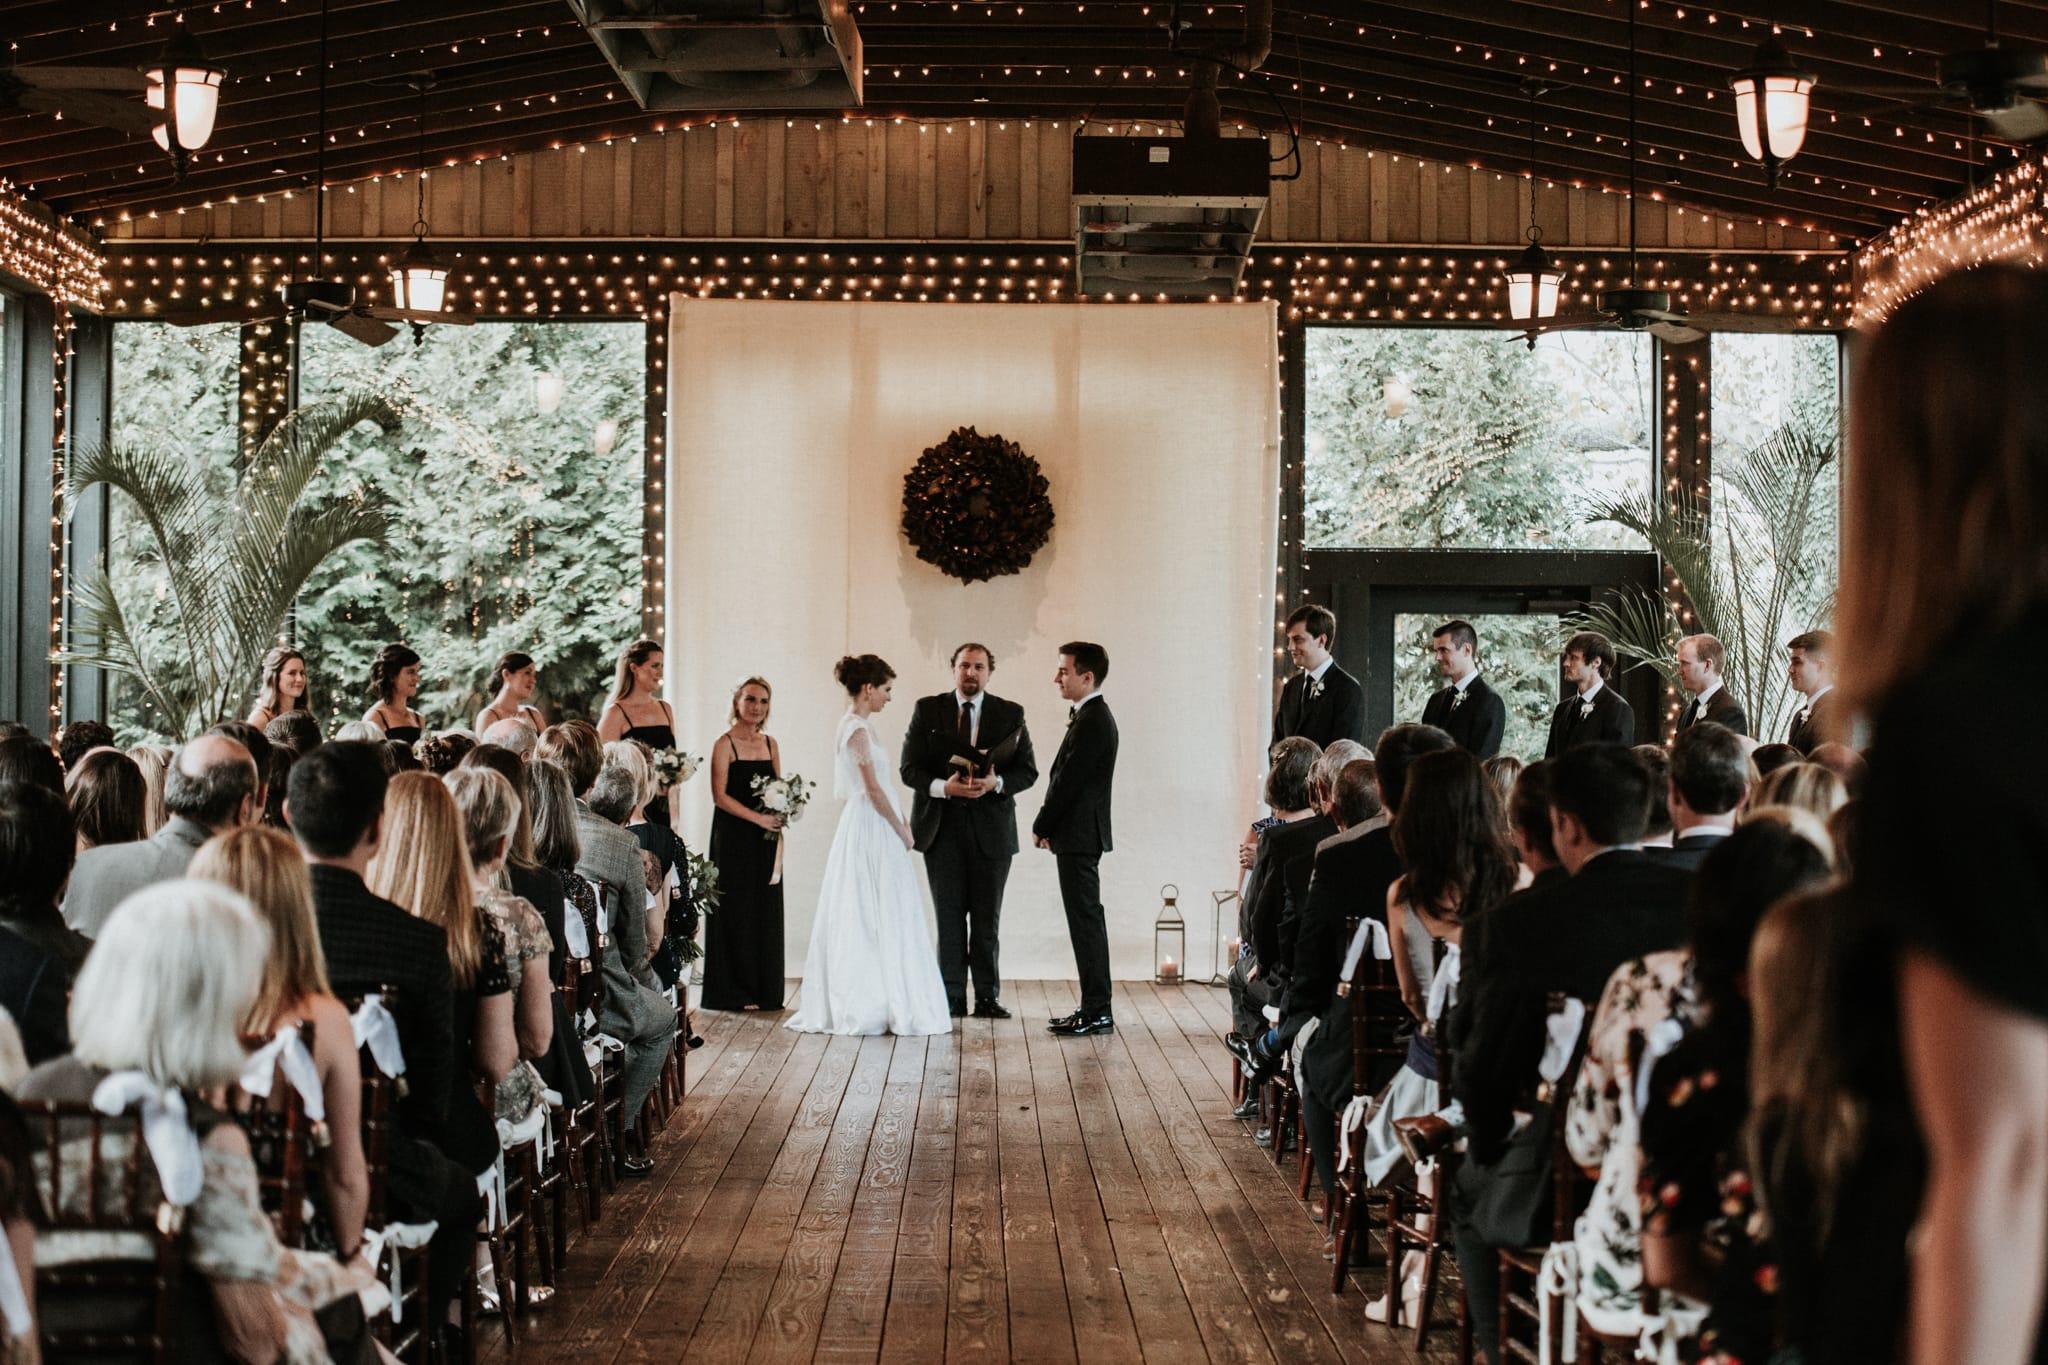 Biltmore-wedding-photographer-asheville-nc-8.jpg